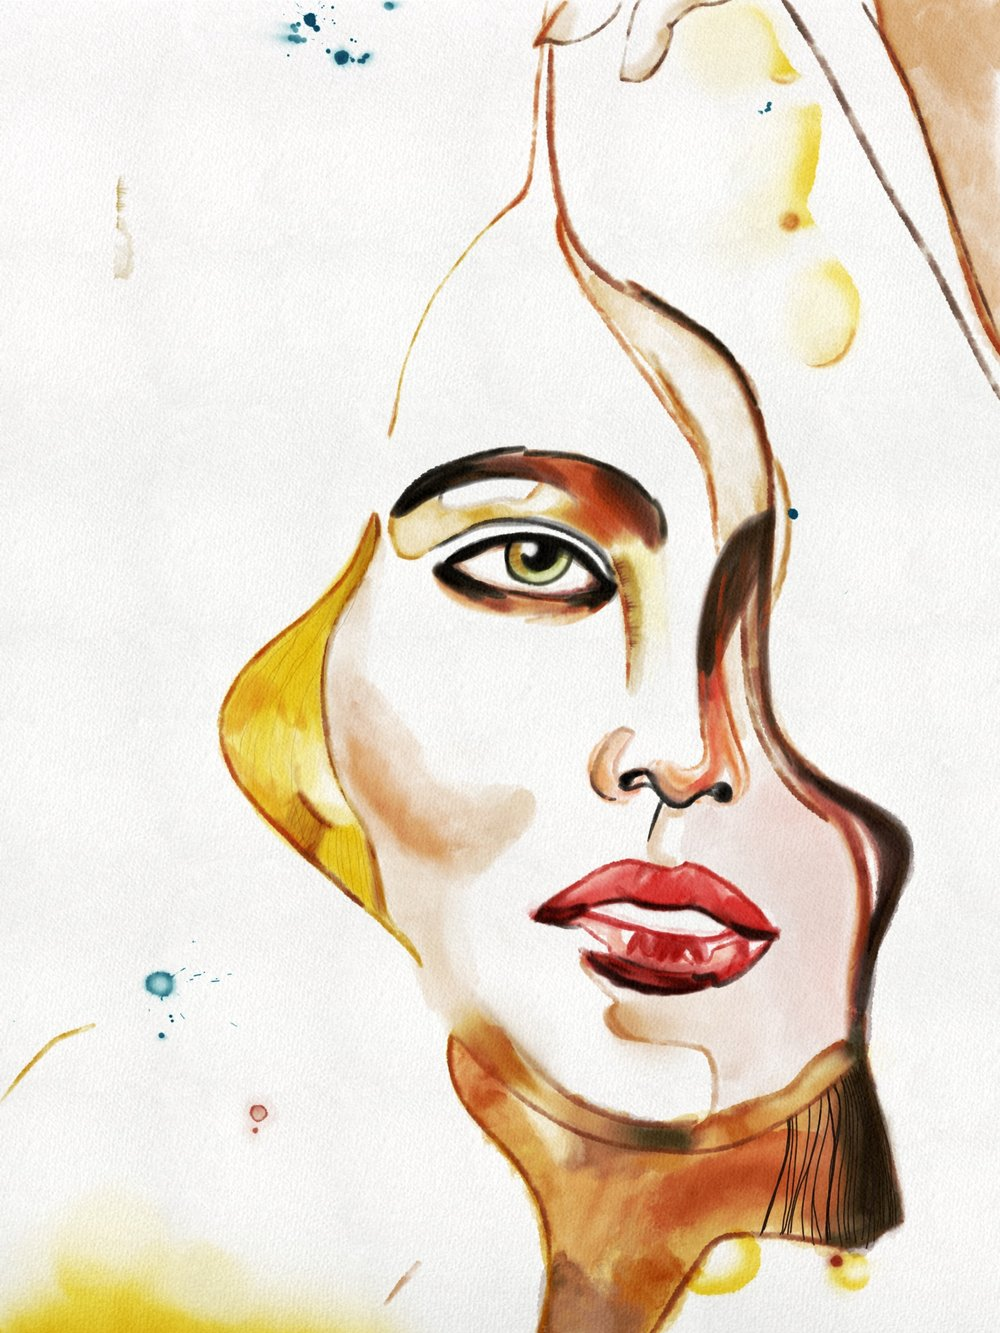 Original art by Samantha Hahn. Recreated Digitally by Briana Christine